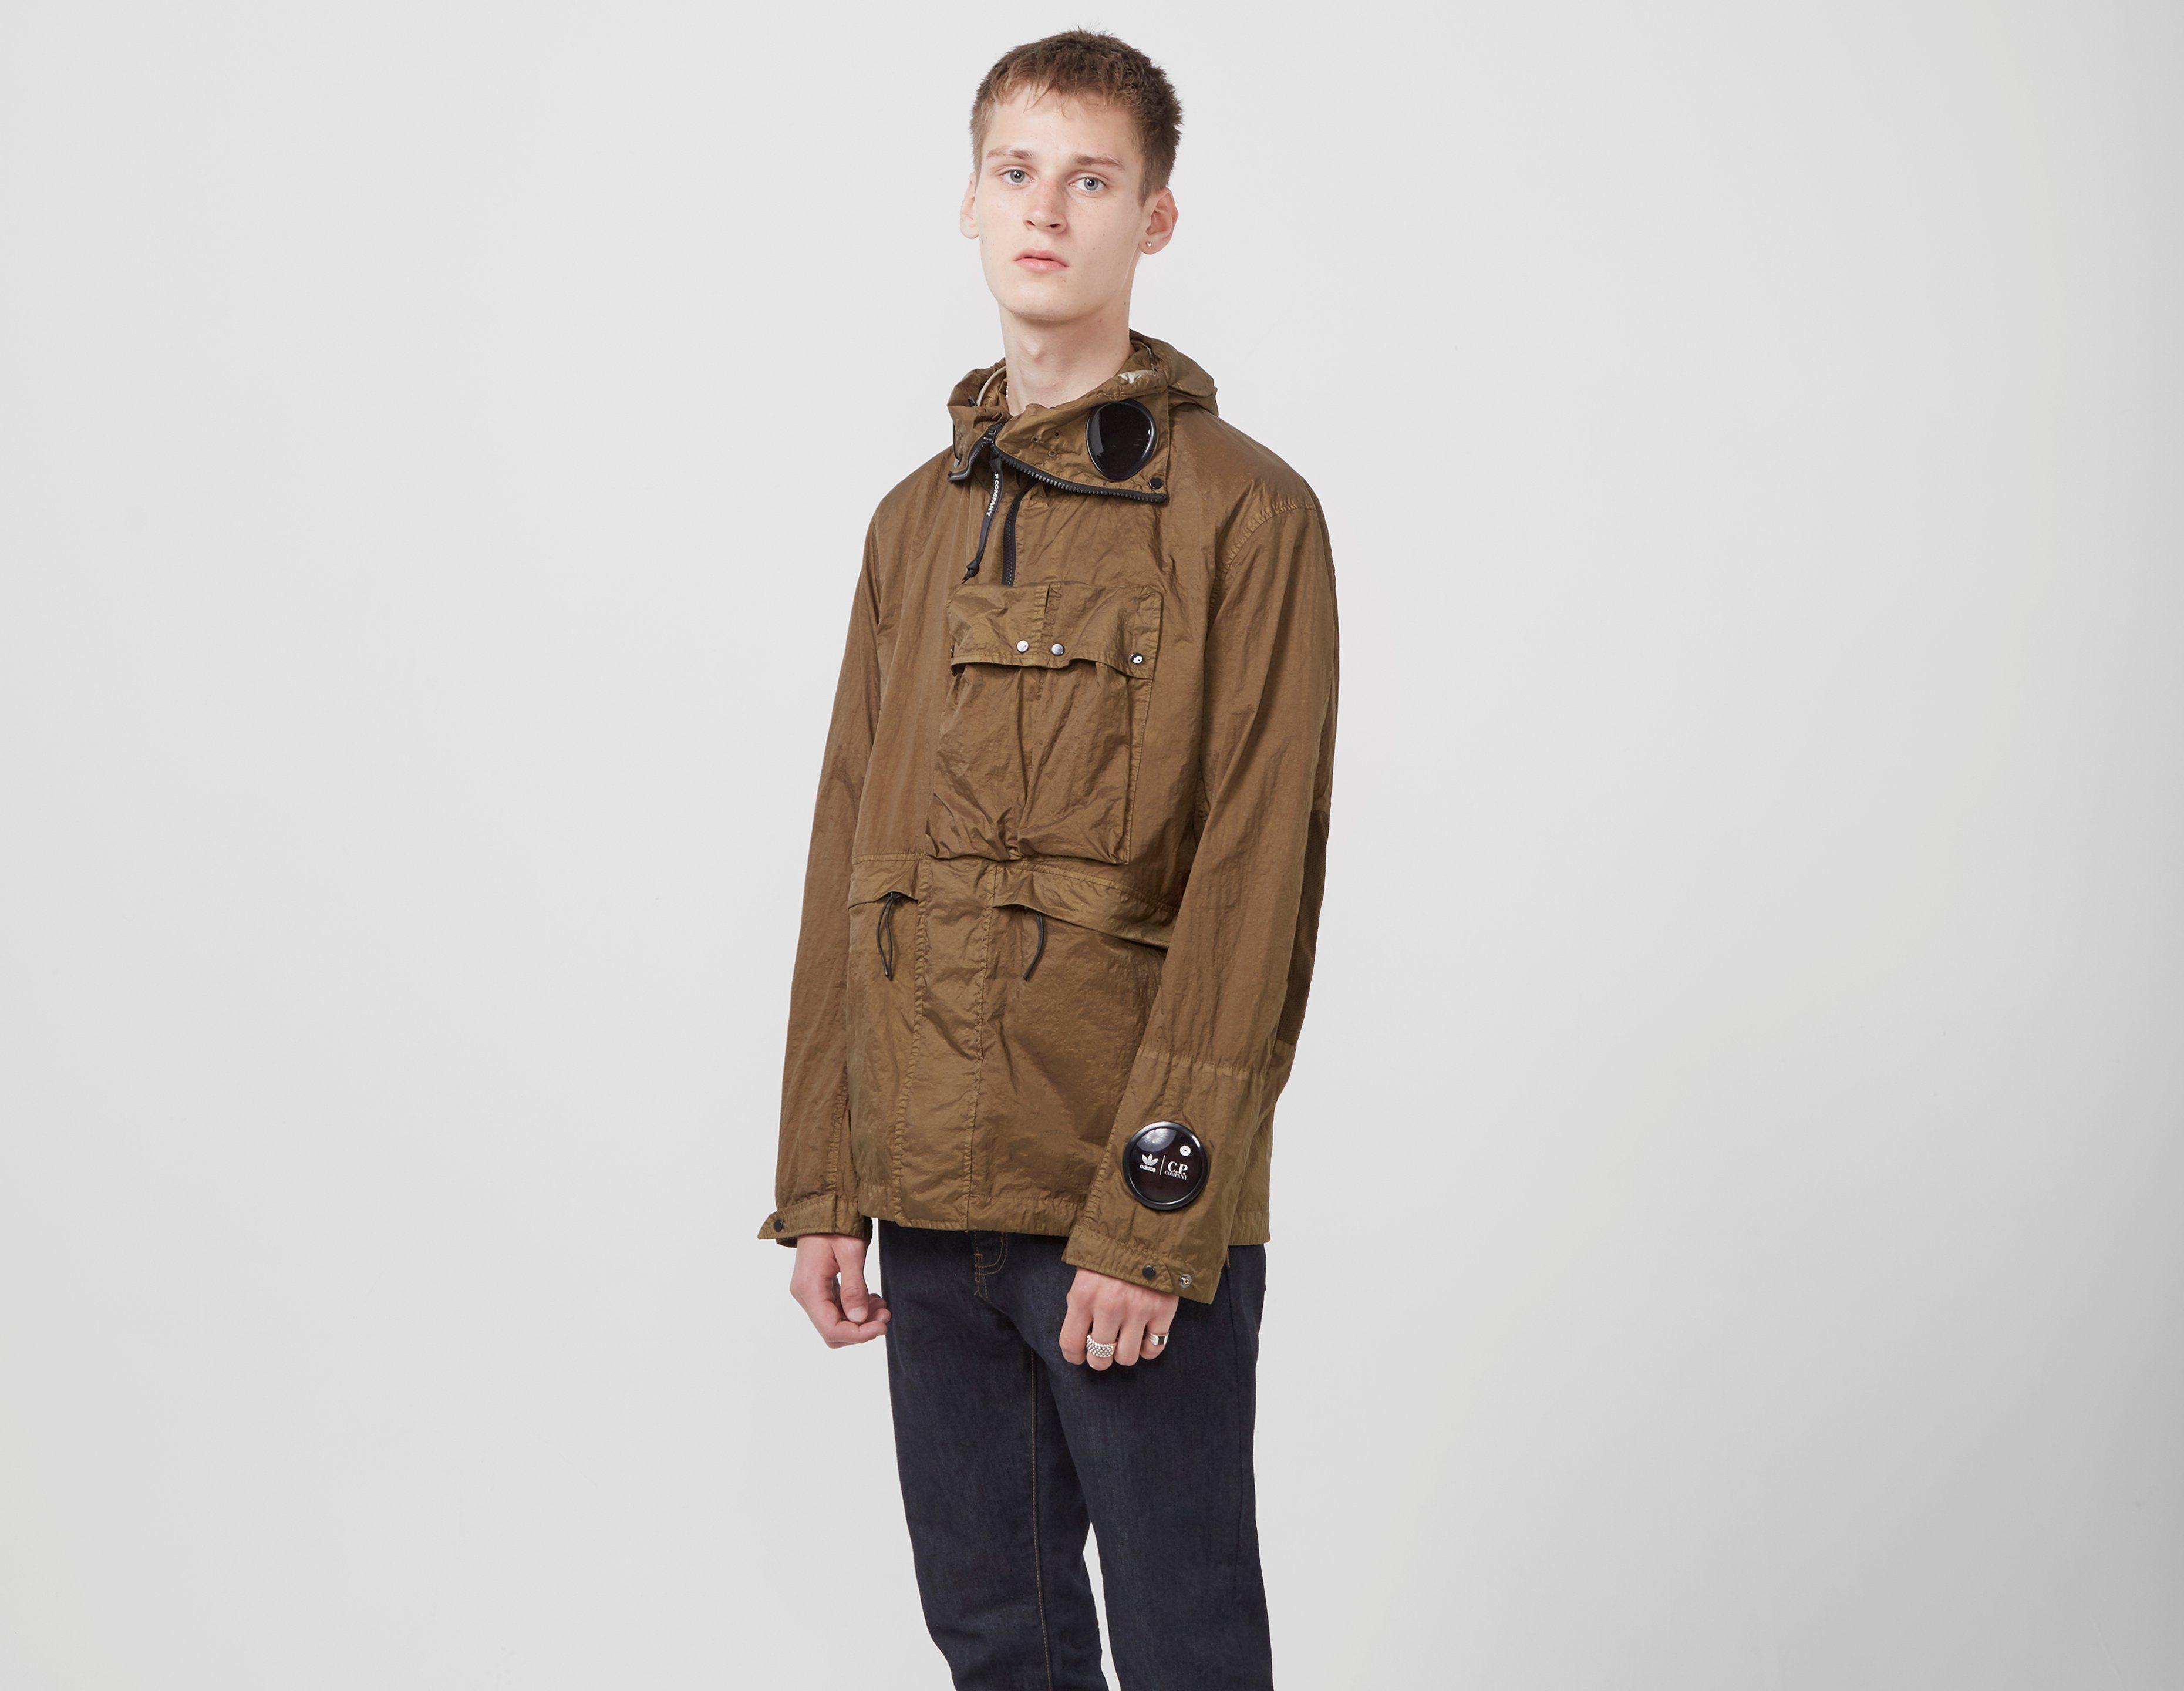 adidas Originals x C.P. Company Explorer Jacket